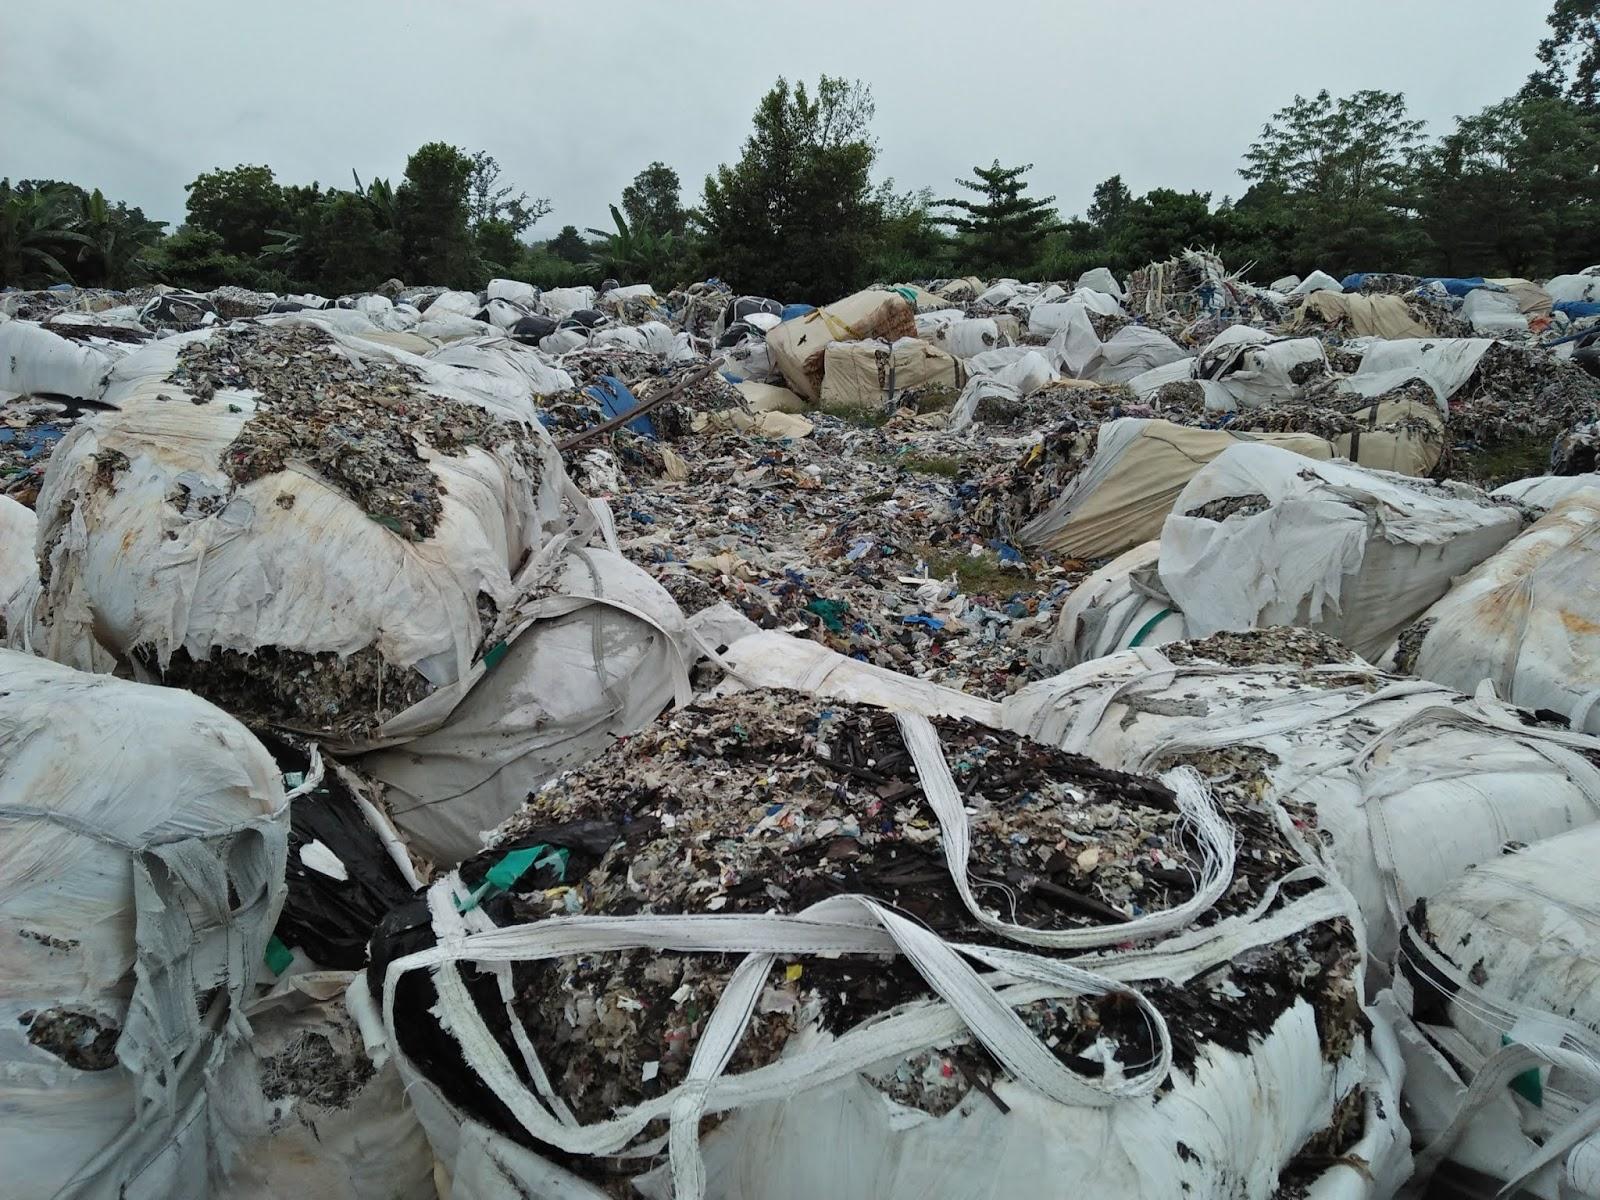 EcoWaste Coalition: January 2019